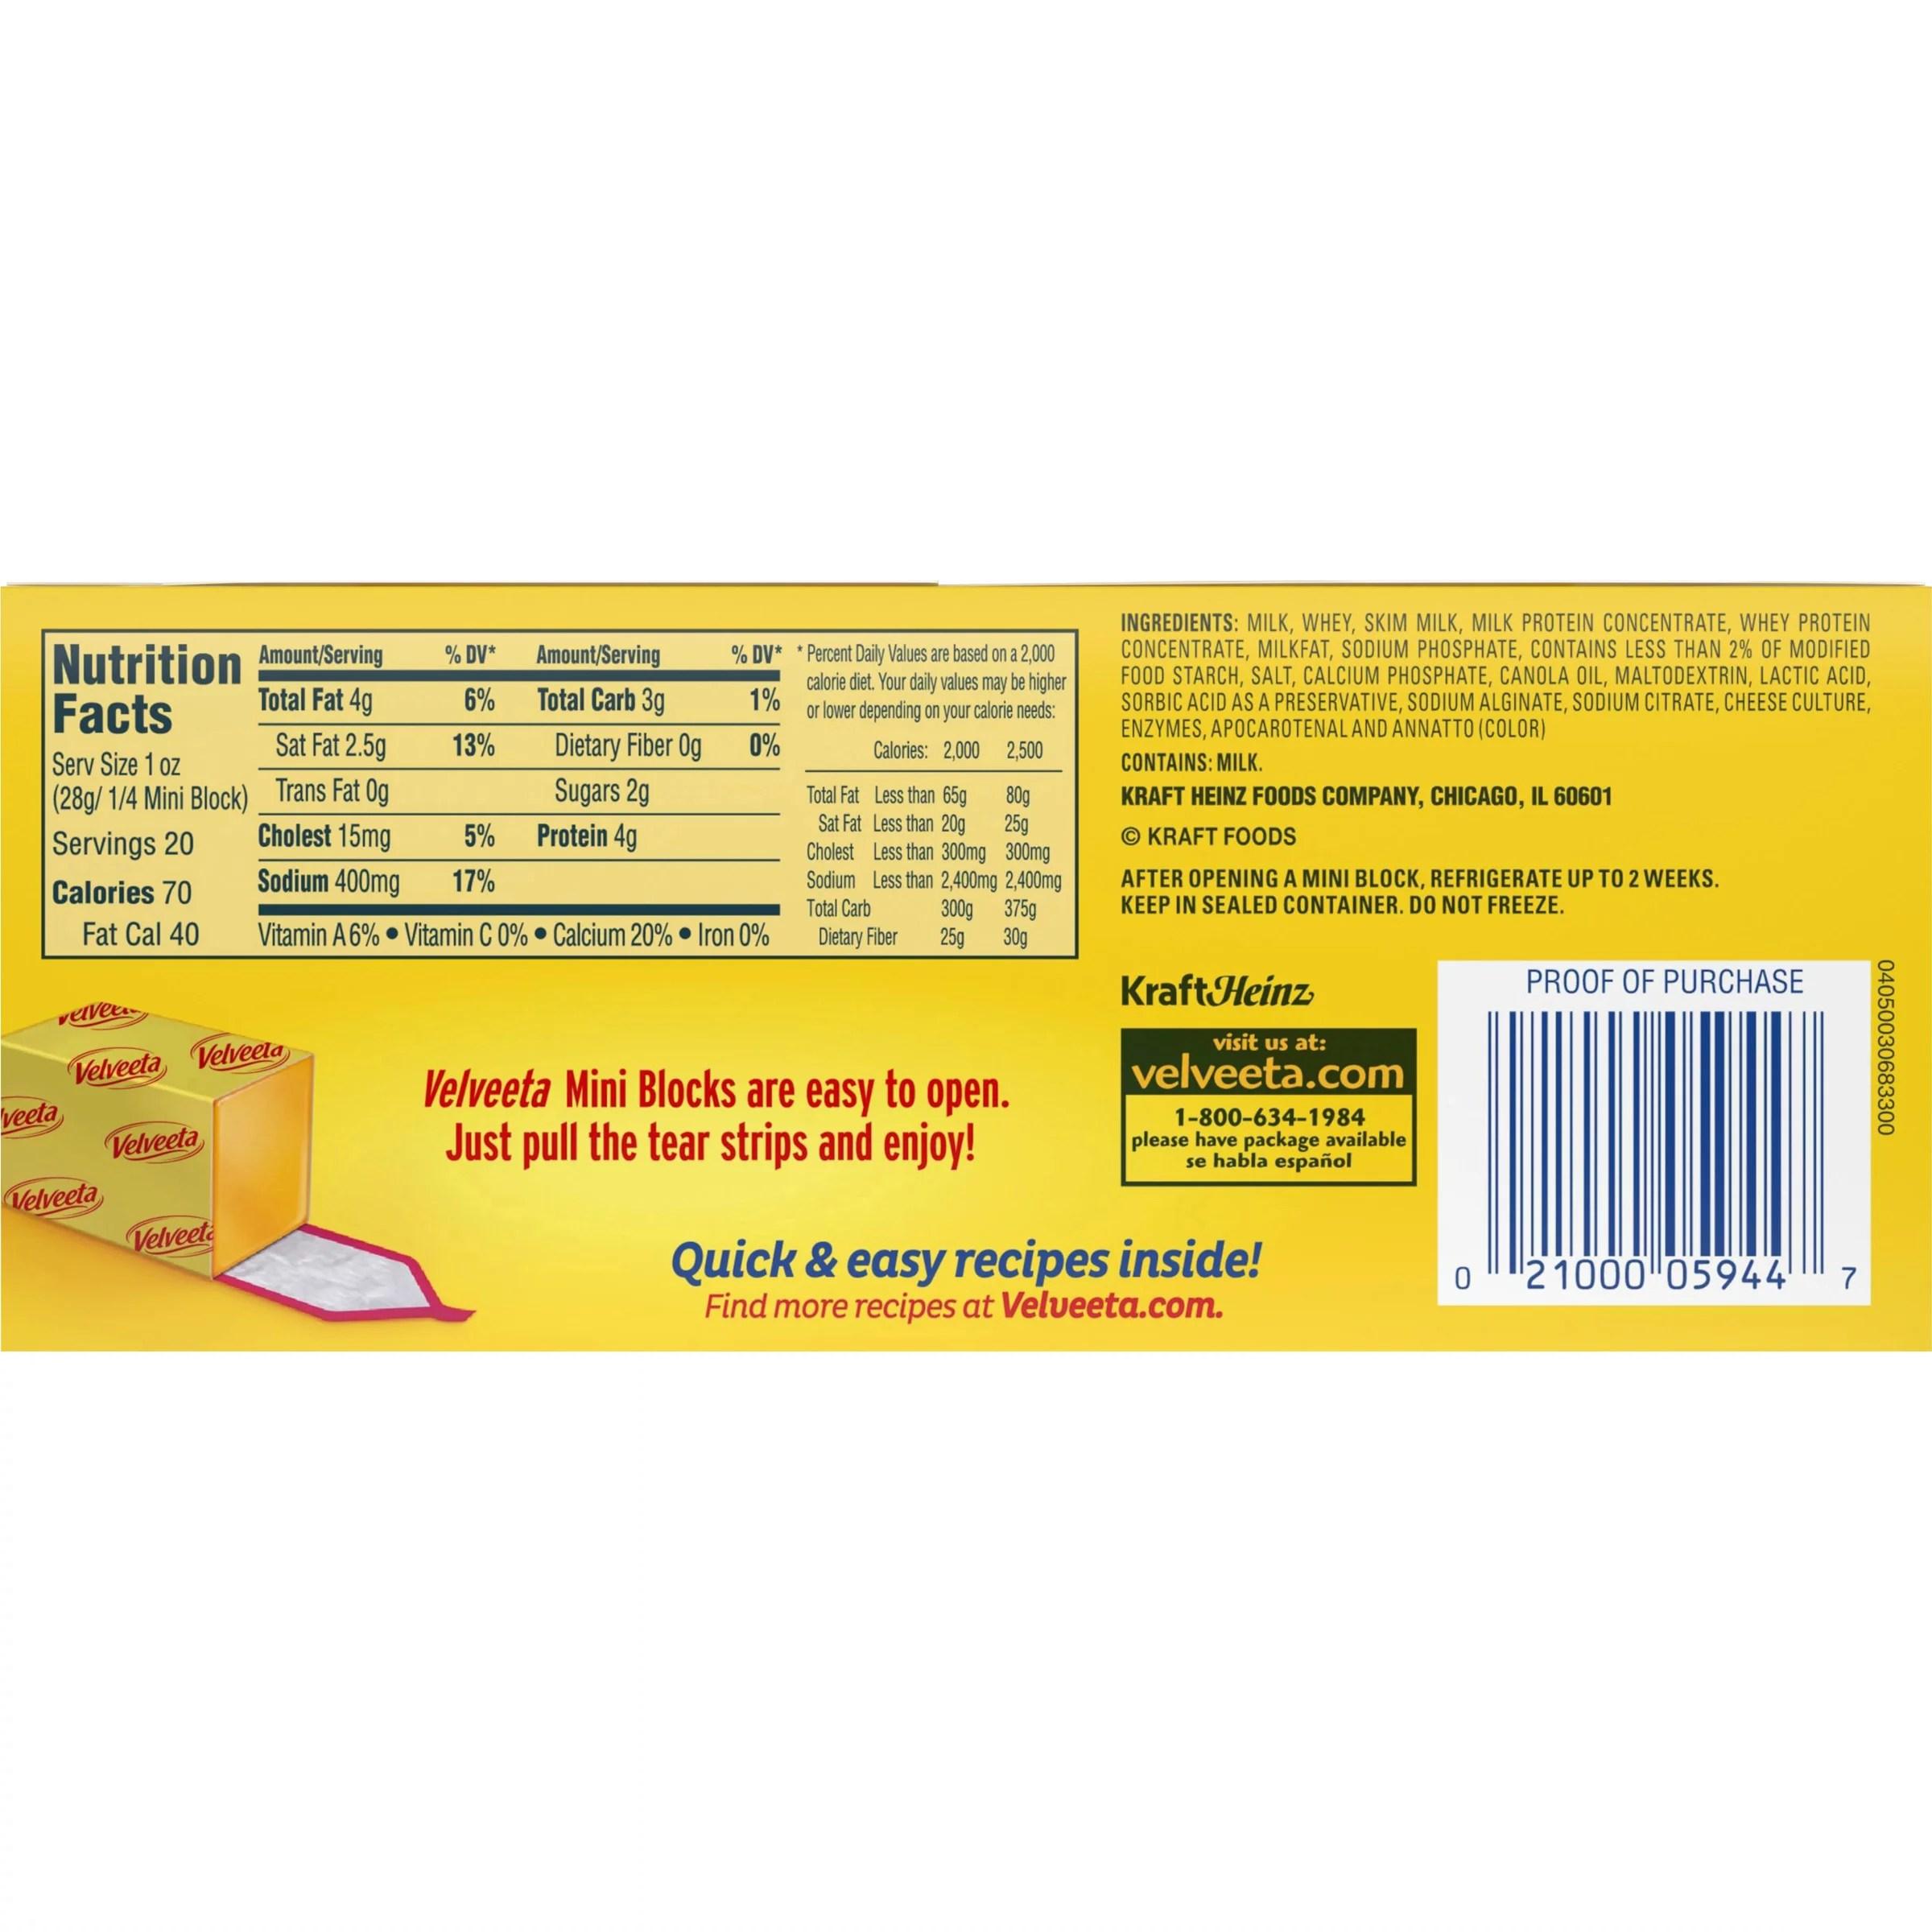 Velveeta Cheese Ingredients Label - Pensandpieces